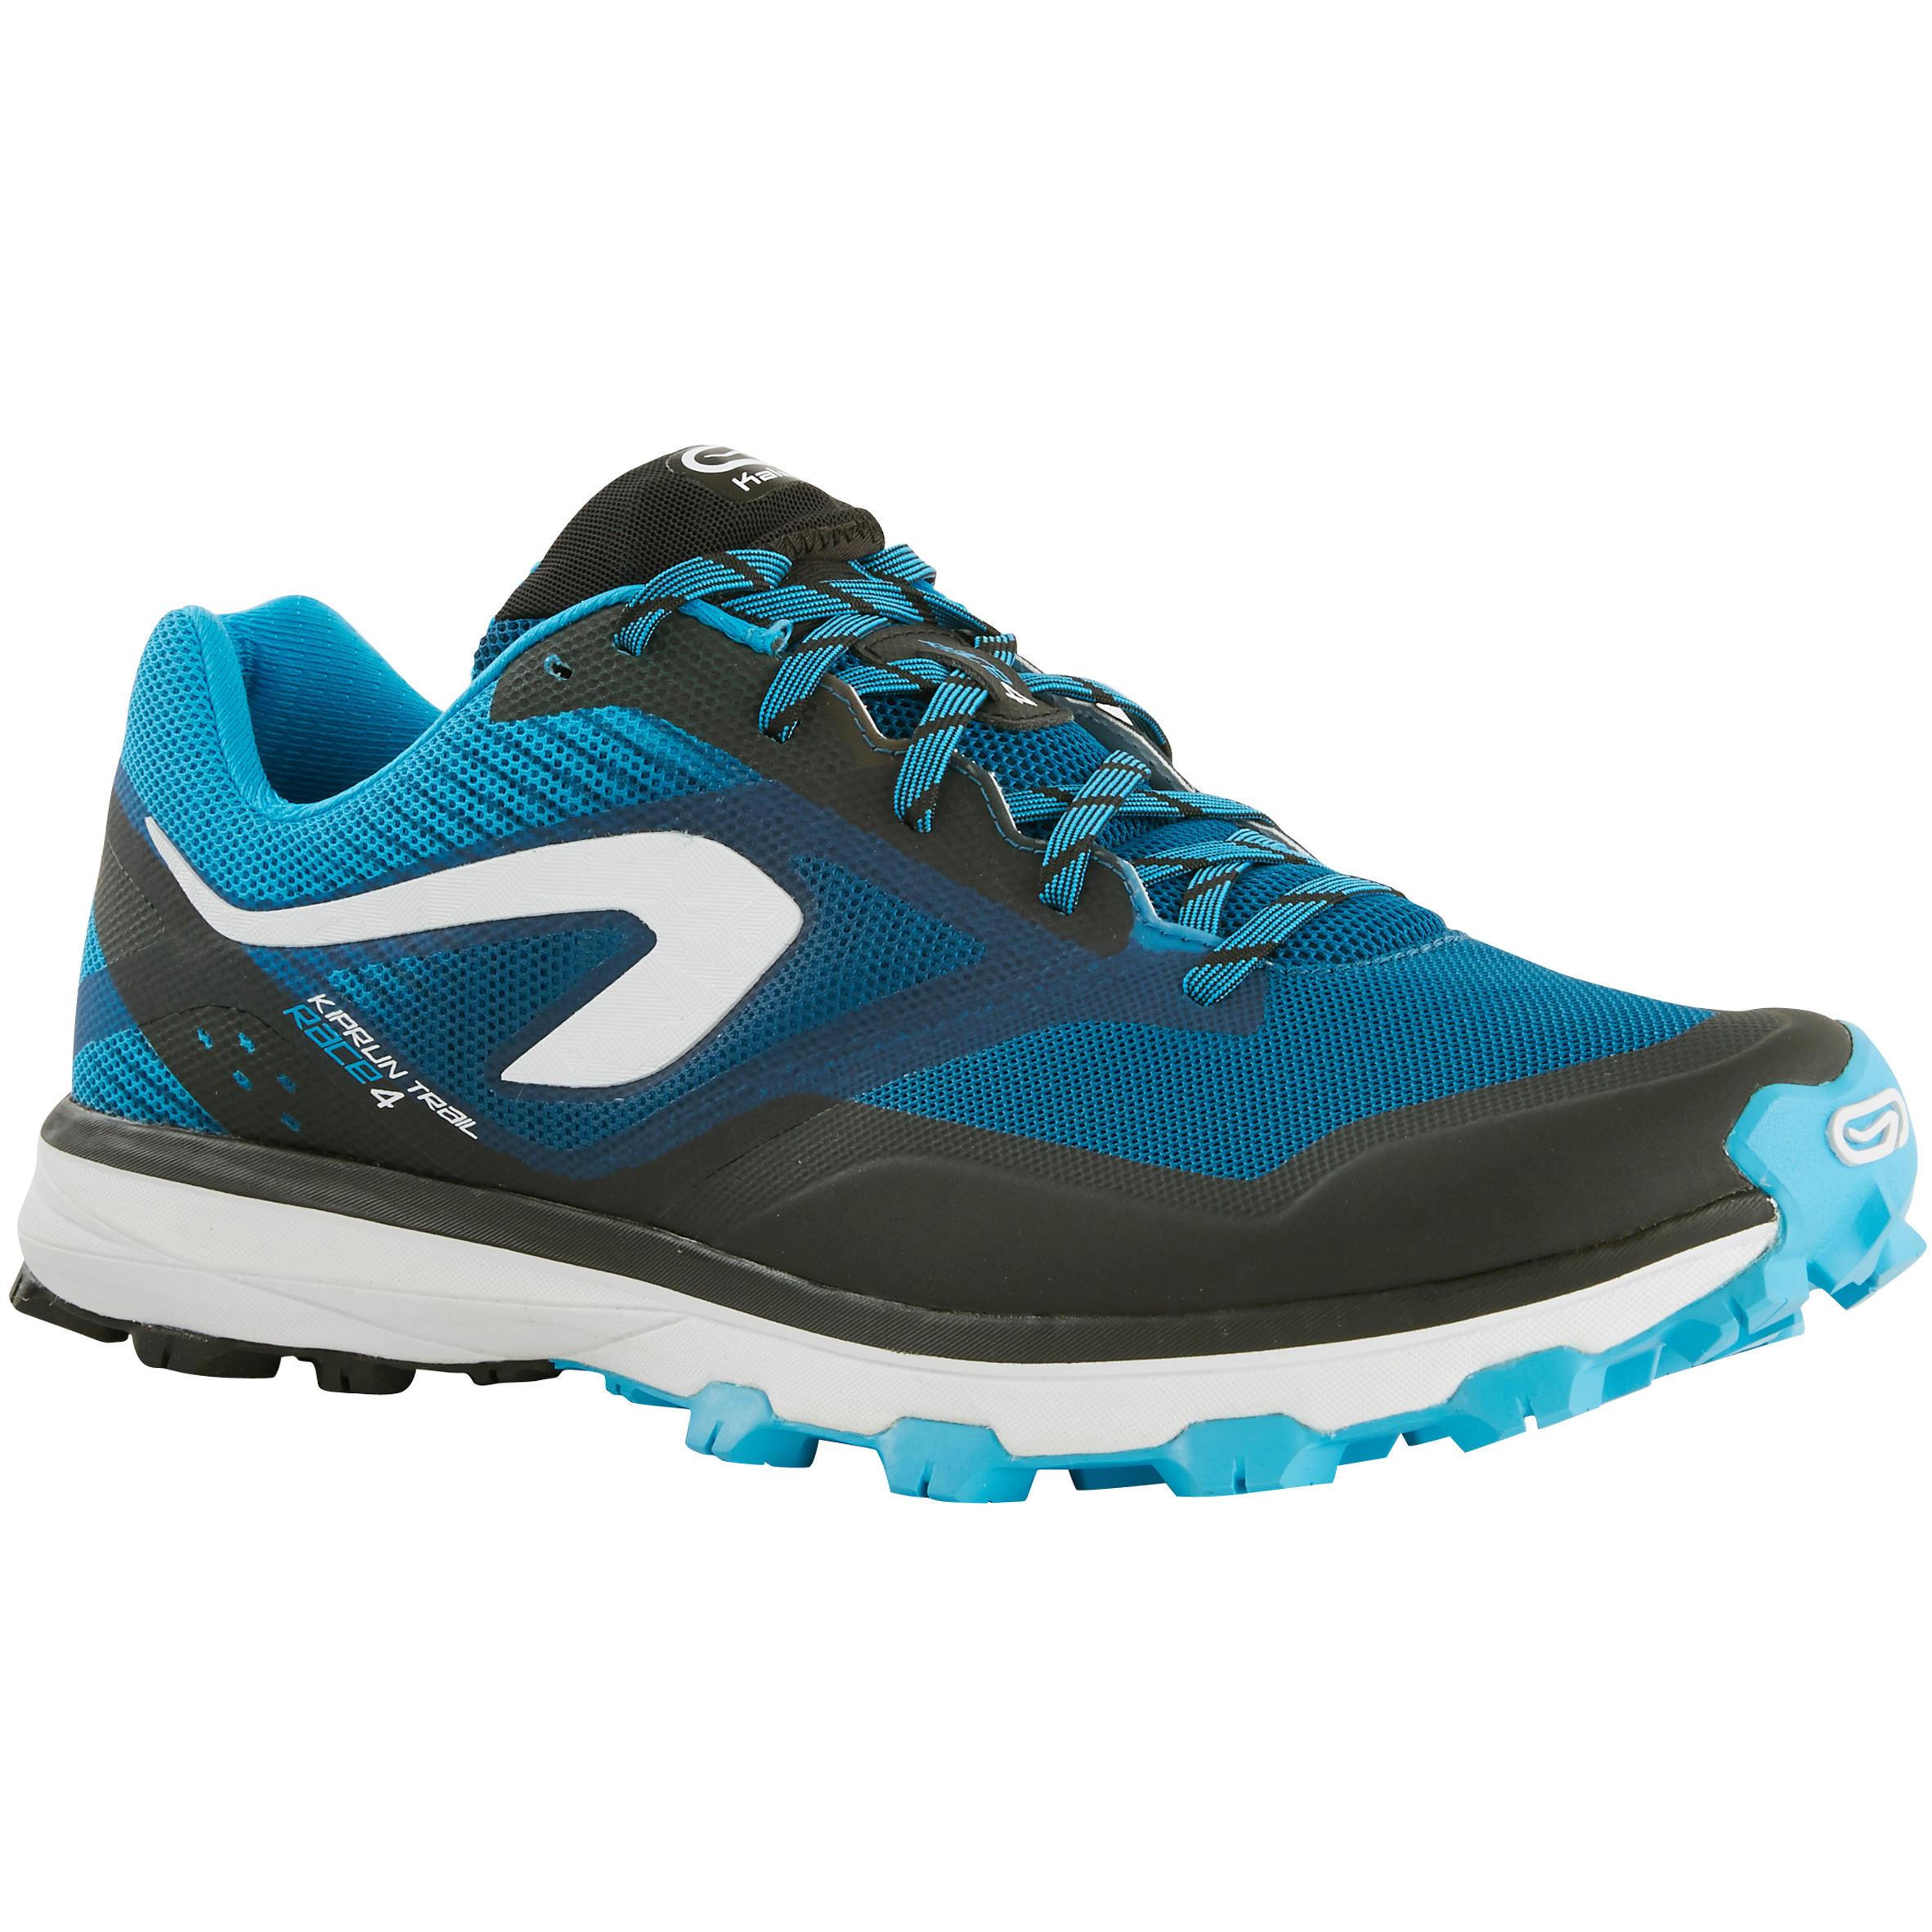 a76ace942ff Comprar zapatillas de trail running